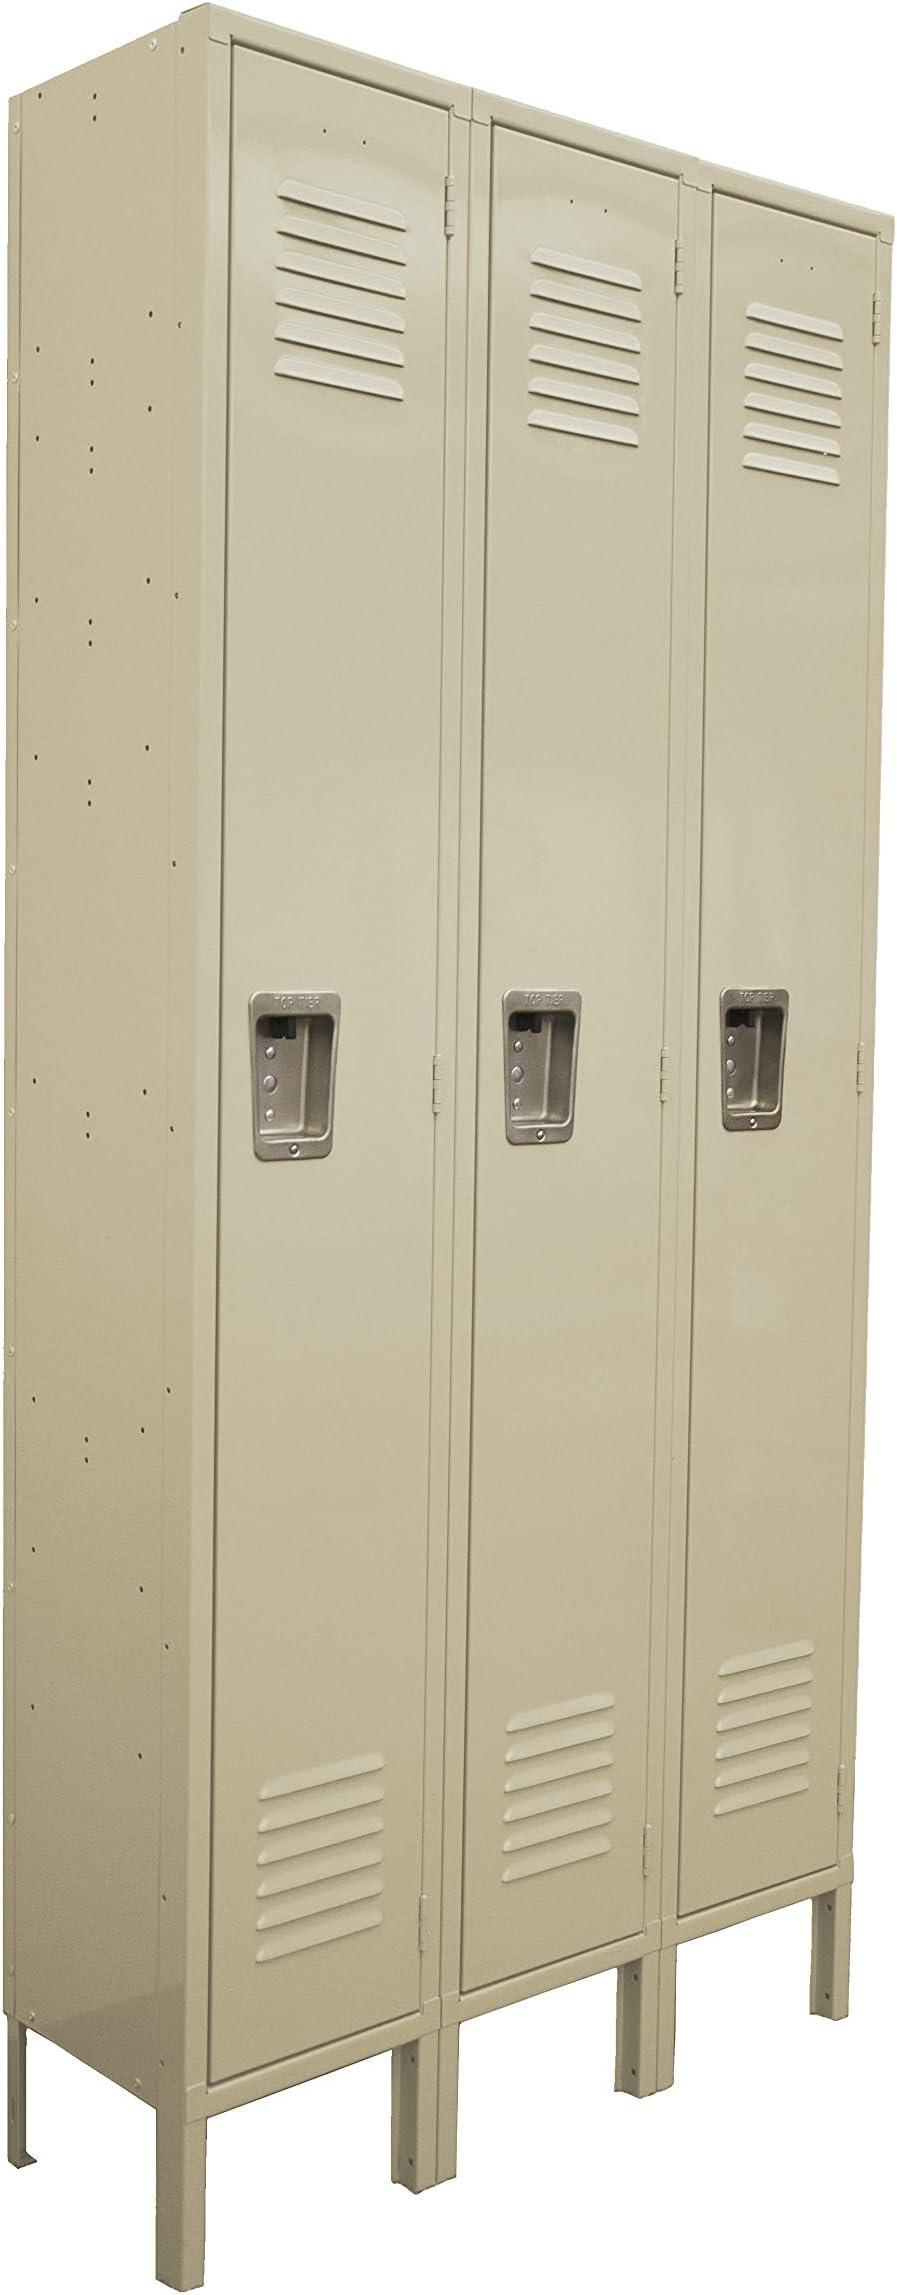 One Tier Locker 6 feet high 3 Wide Unit w/ 3 Doors with Louvers 12W x 18D x 78H Unassembled Tan Metal Locker Perfect as a School Locker, Gym Locker or Lockers for Employees